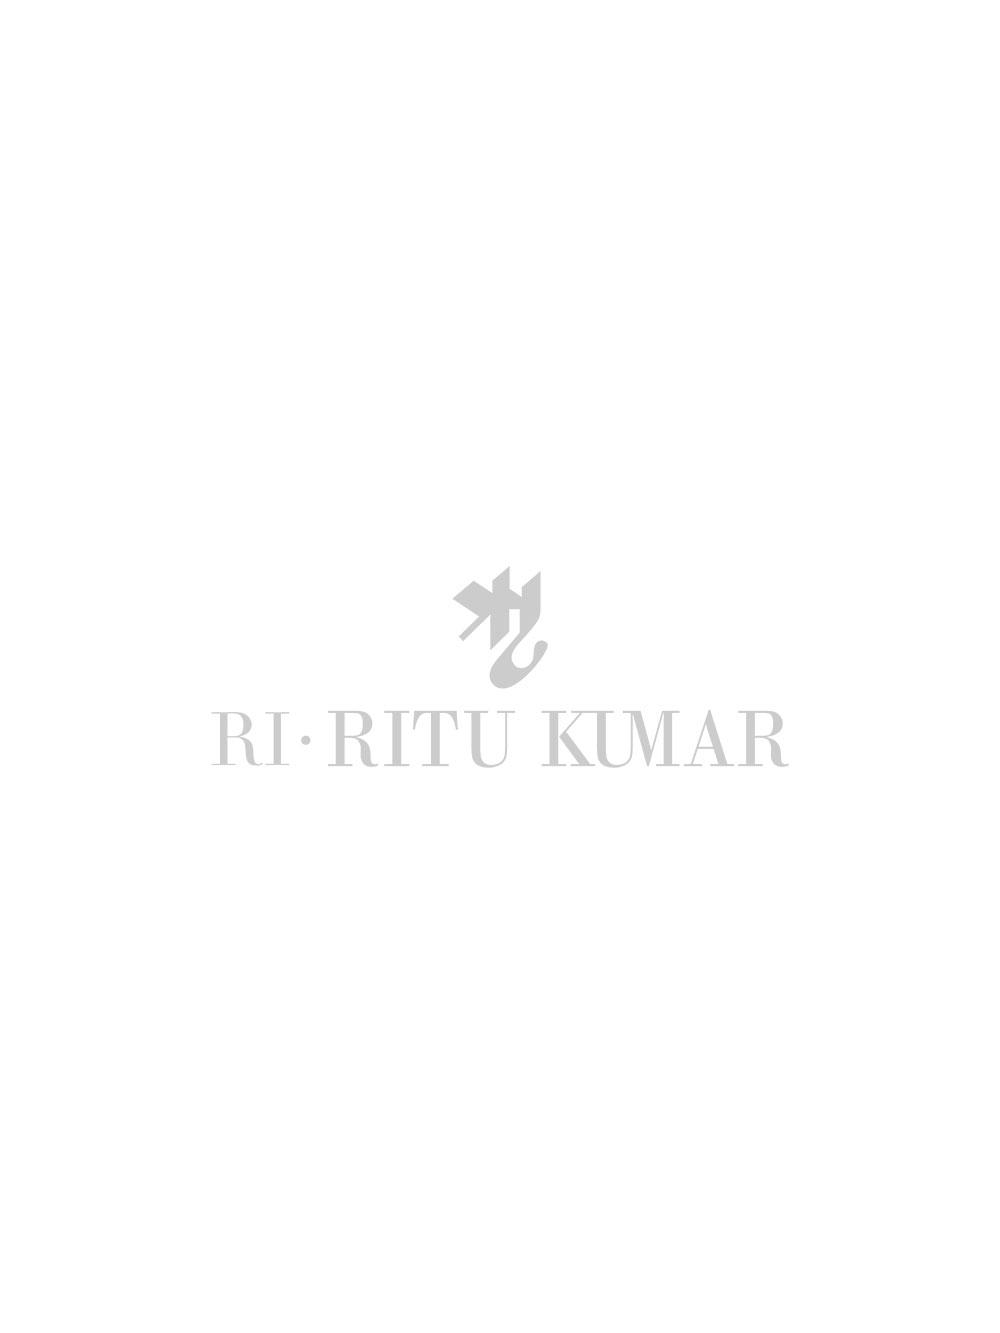 Turquoise & Mauve Embroidered Kurta With Dupatta And Churidar